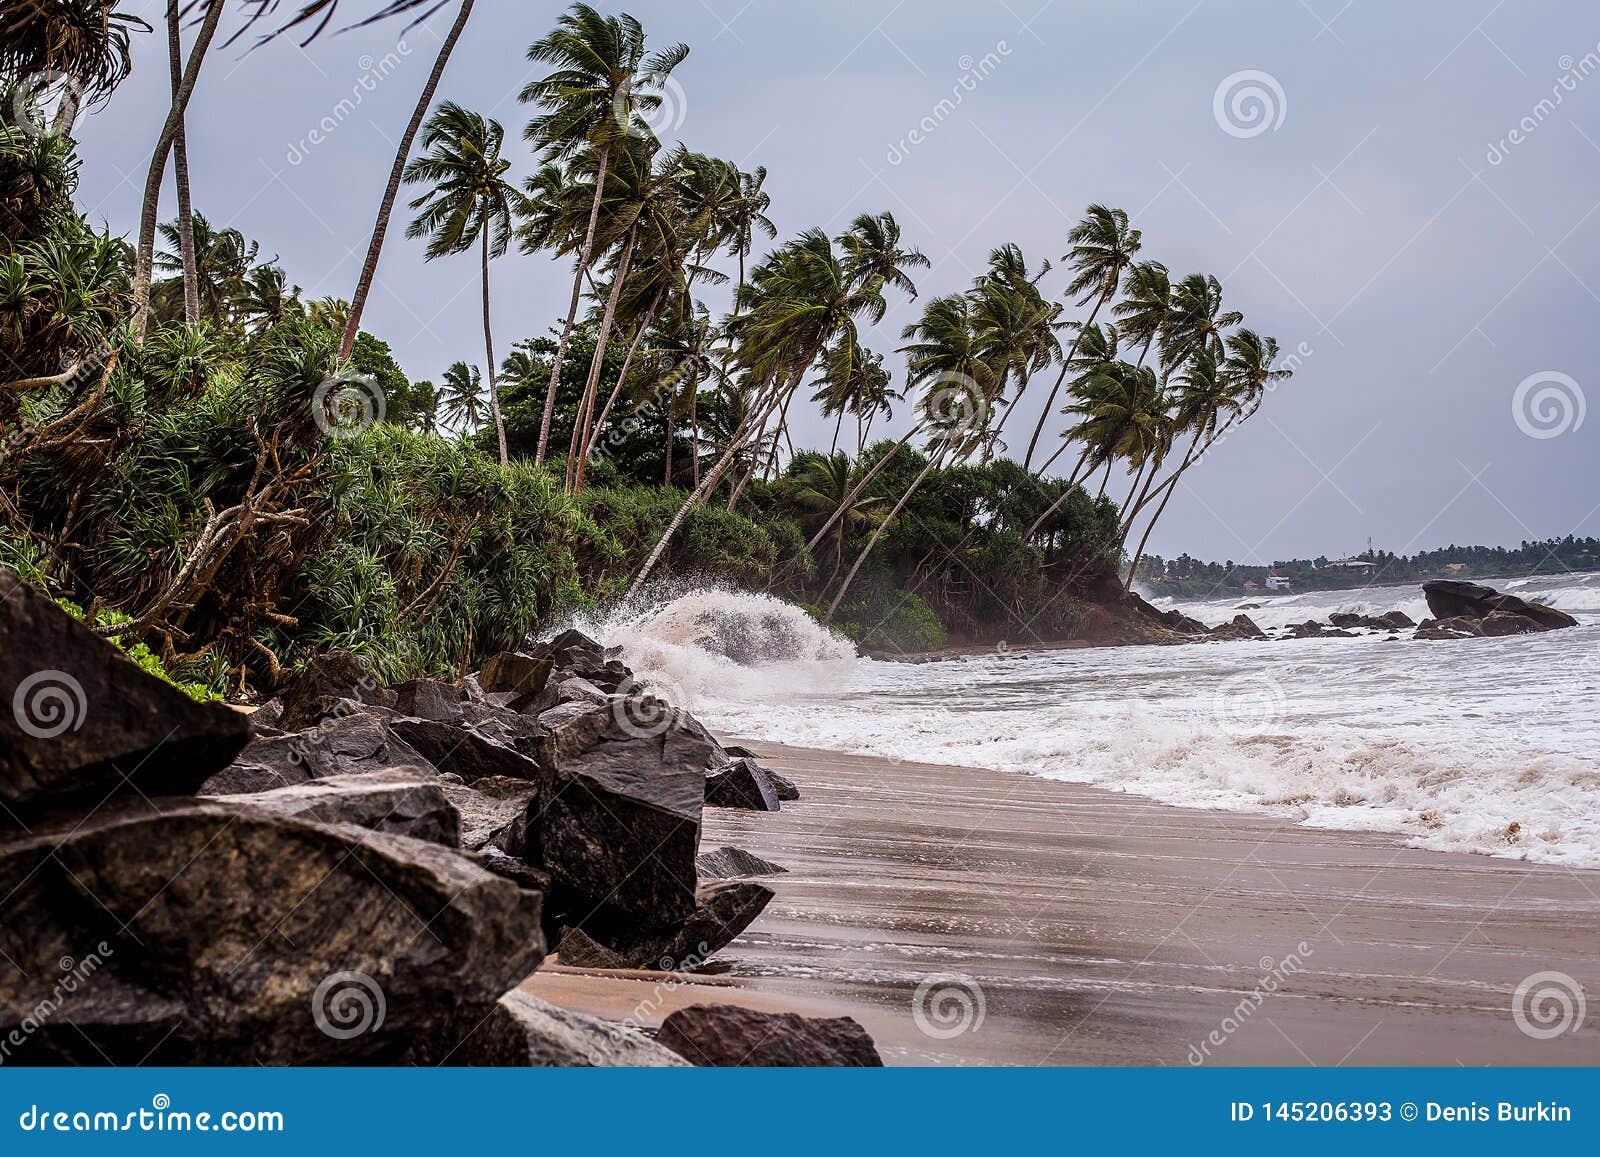 Uma tempestade pequena na praia rochosa de Sri Lanka ondas na praia selvagem bosque da palma no Oceano Índico